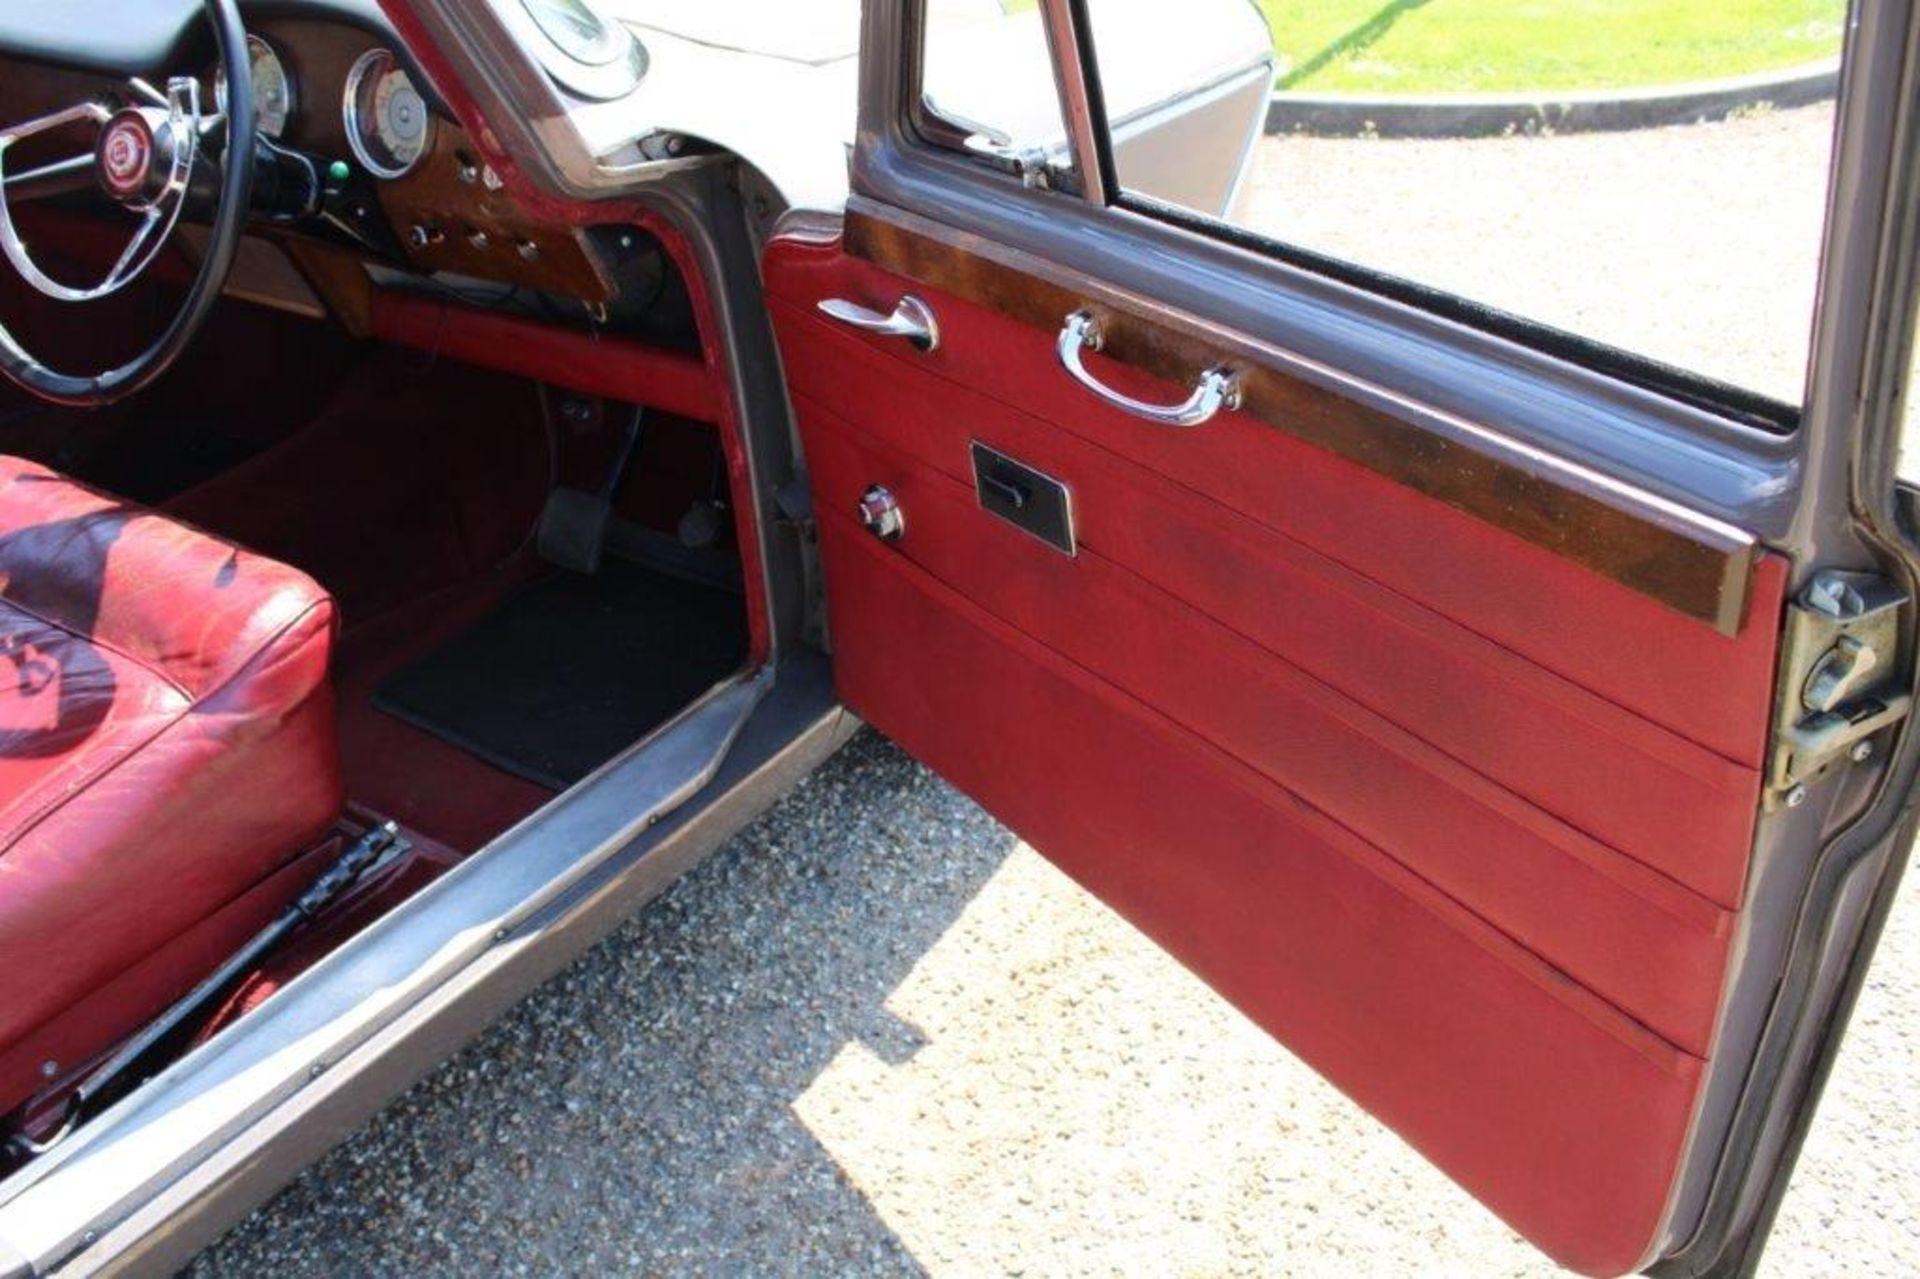 1969 Wolseley 16/60 Auto - Image 17 of 31